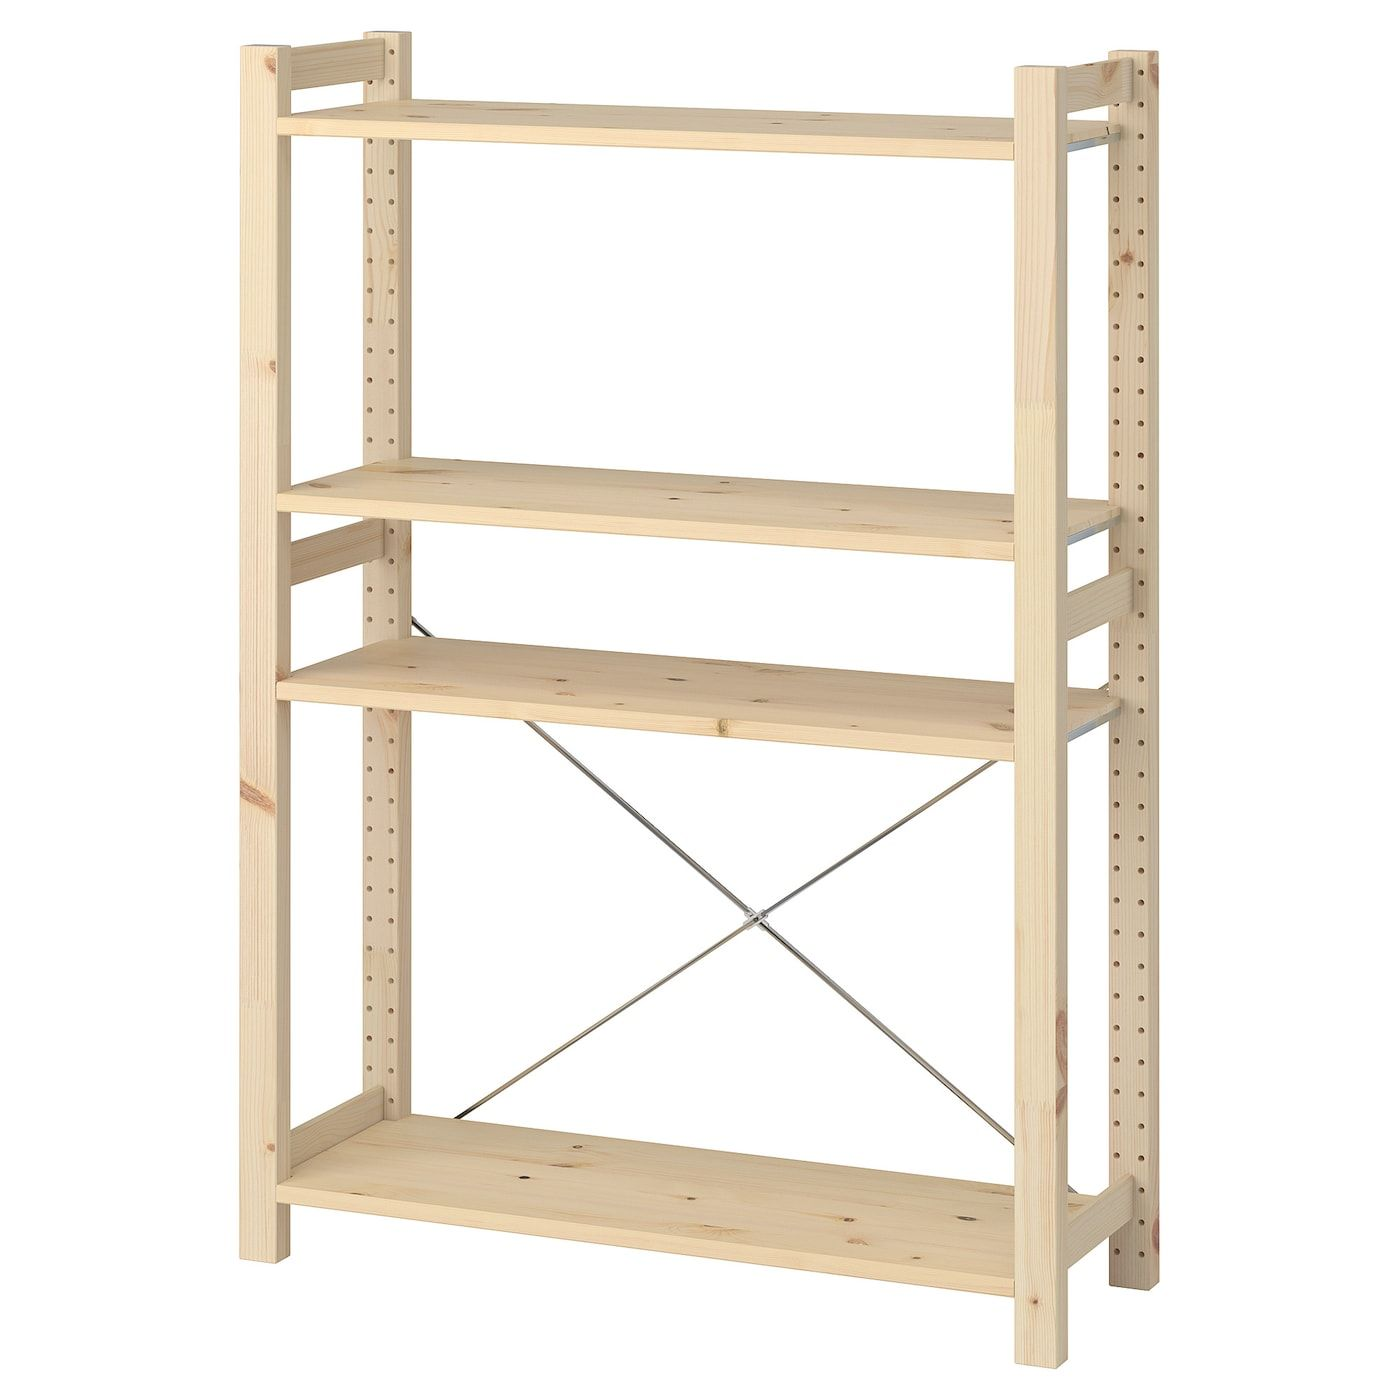 Ikea Ivar Pine Shelf Unit Ikea Shelving Unit Ikea Shelves